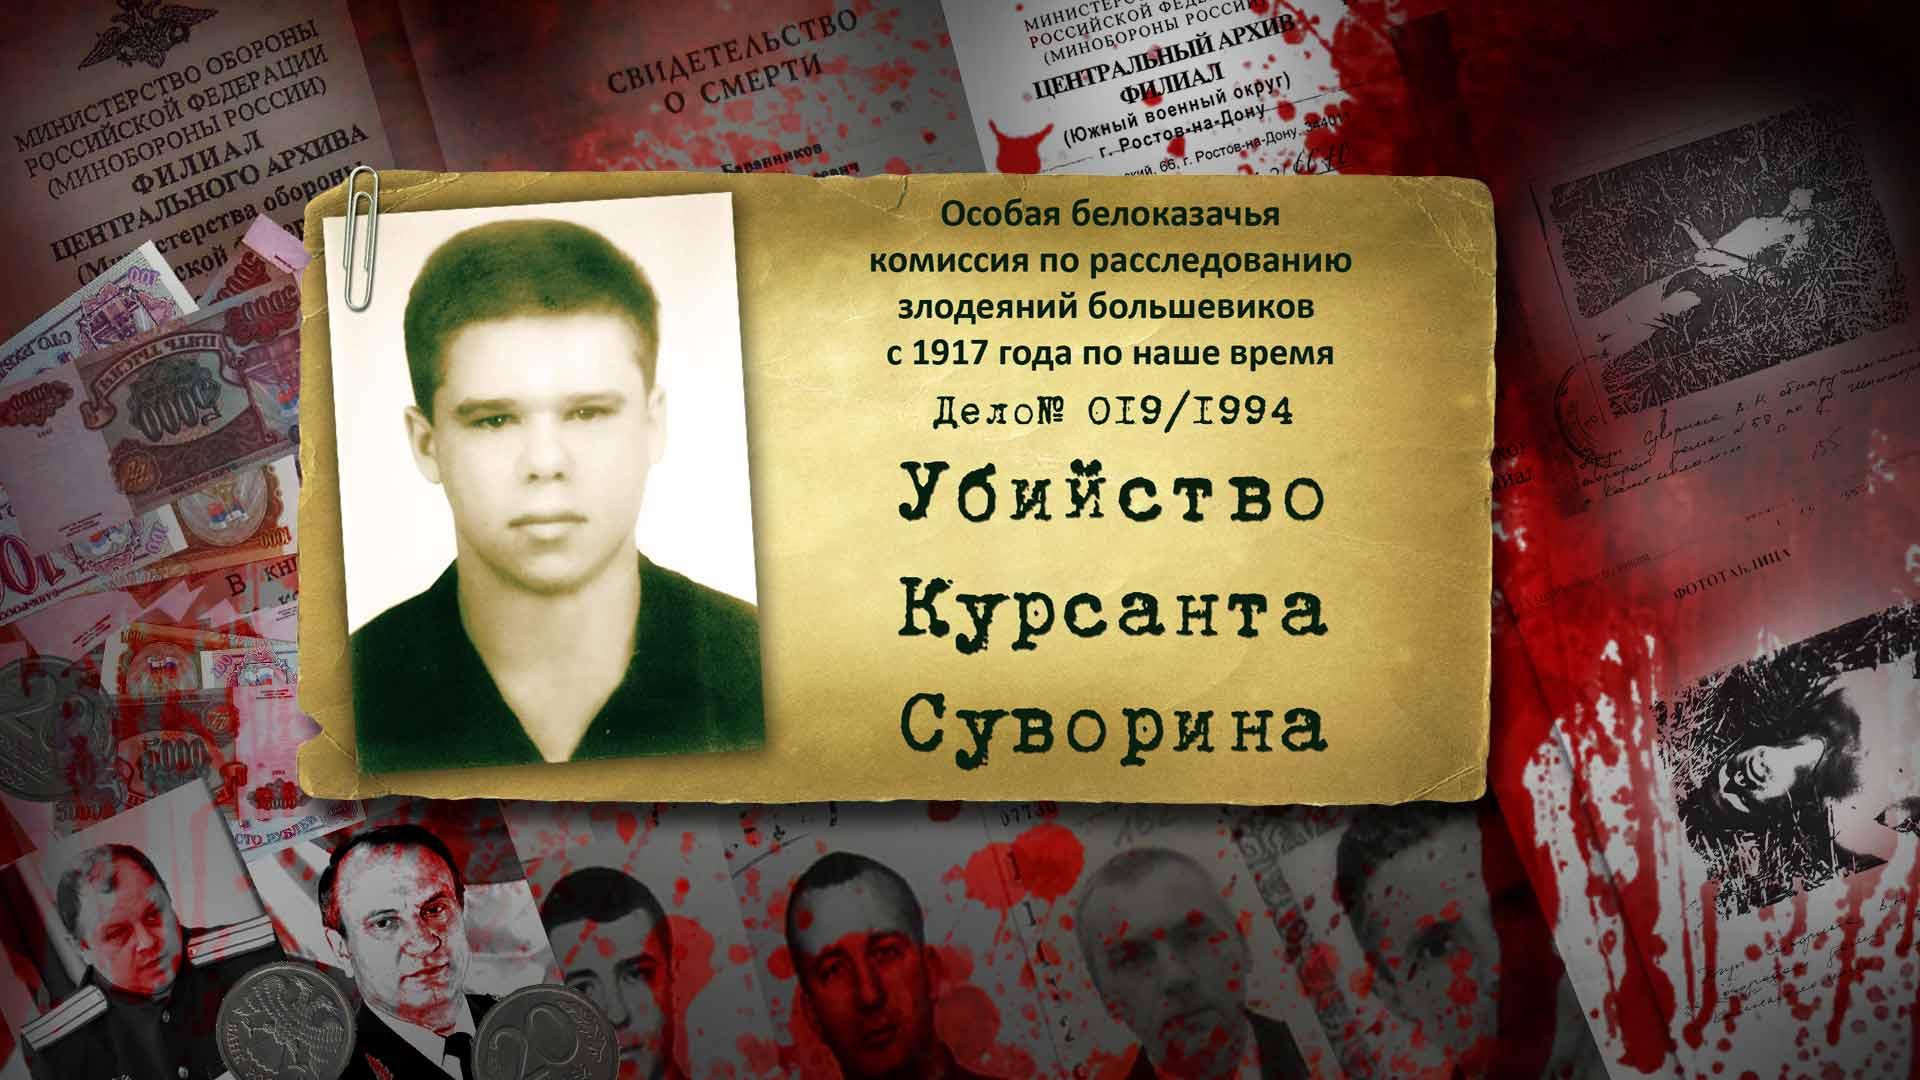 Убийство курсанта Суворина в Новочеркасске.